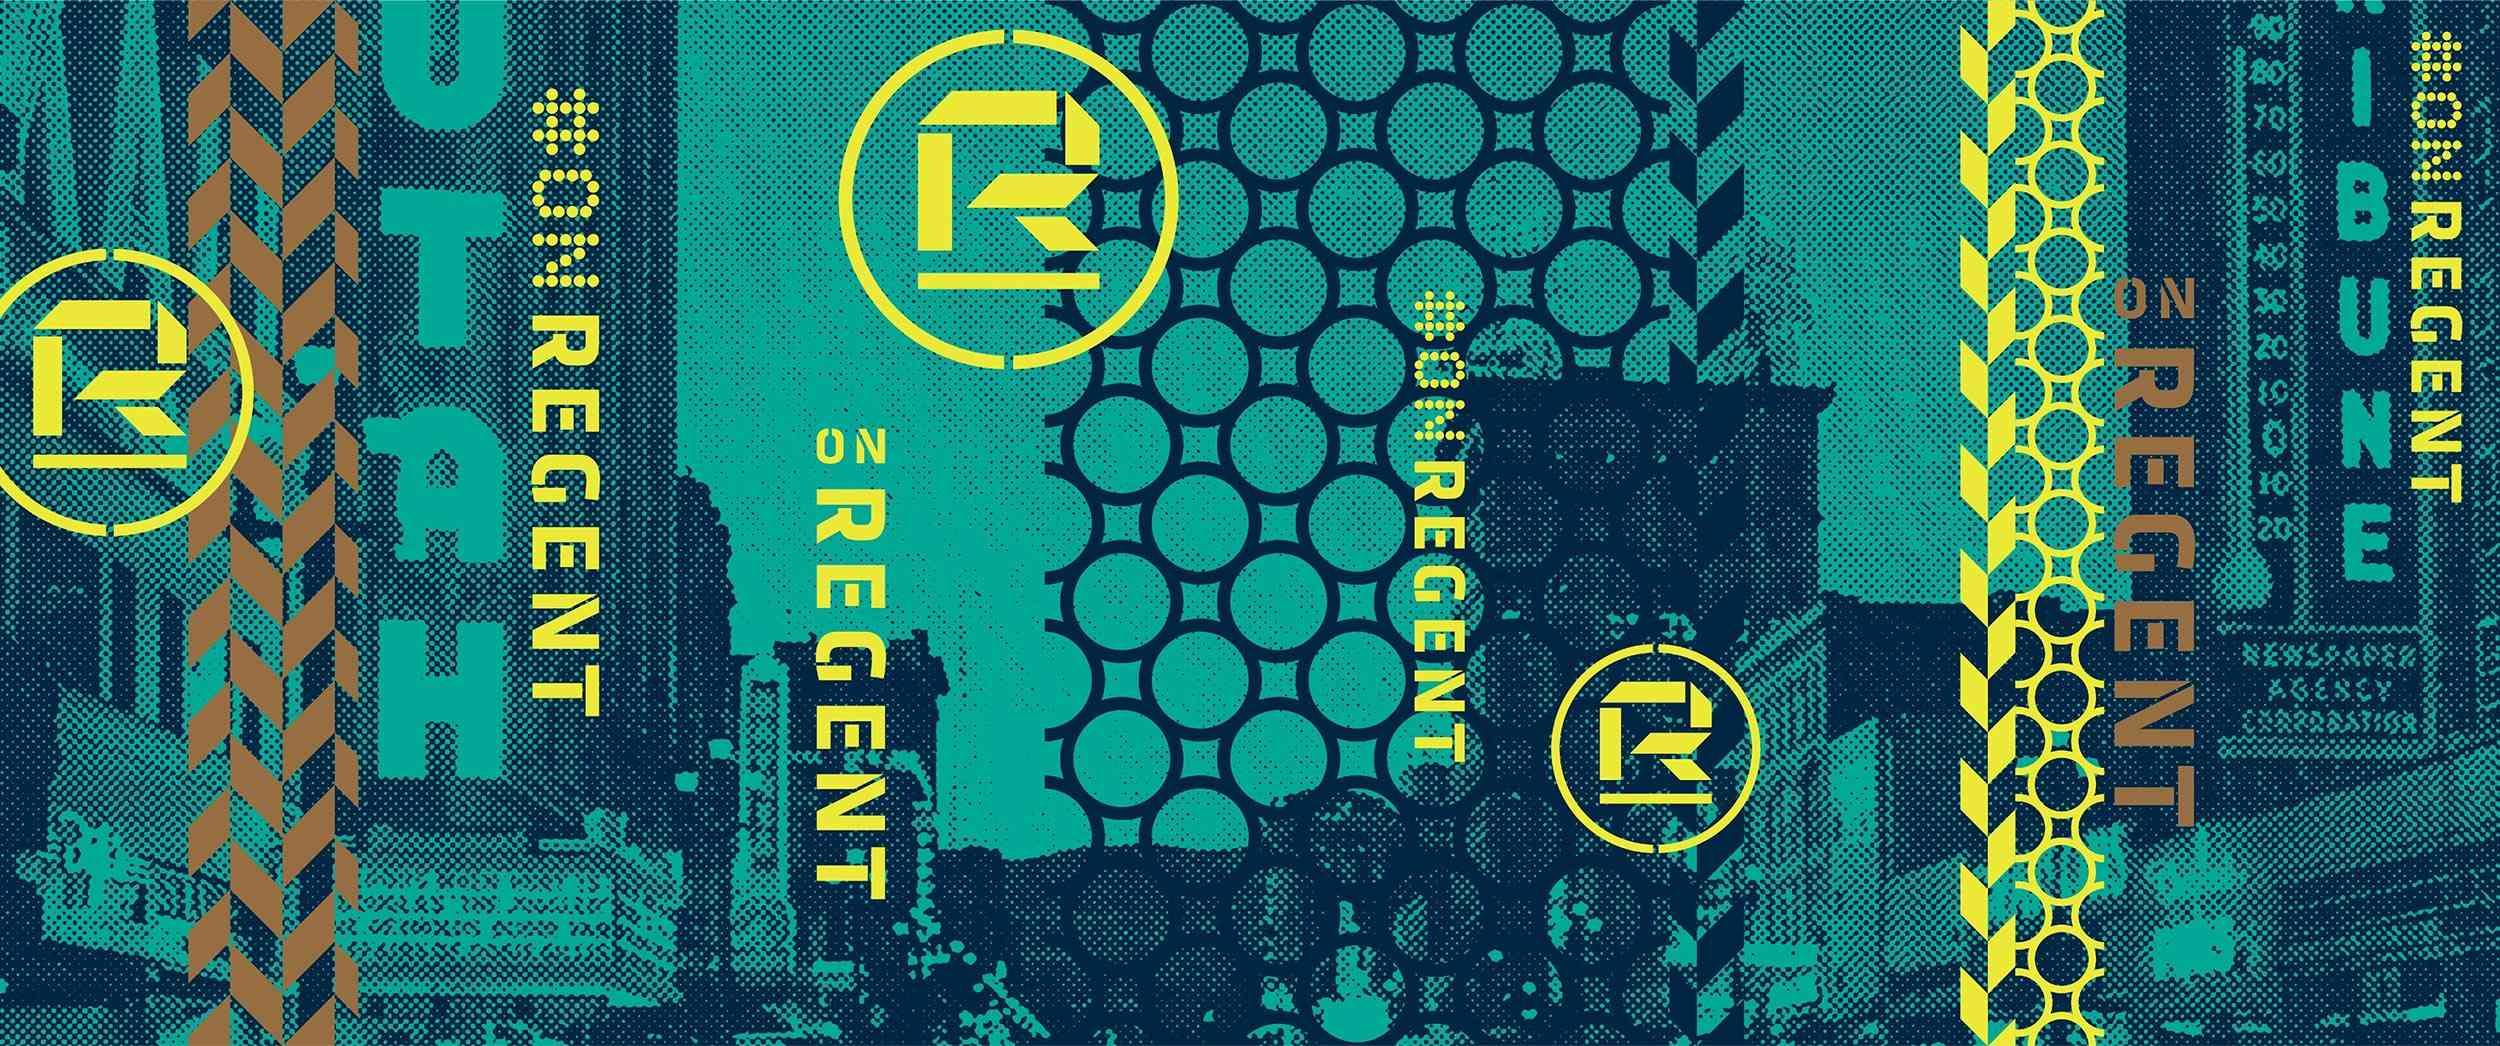 #OnRegent and R Logo Artboard